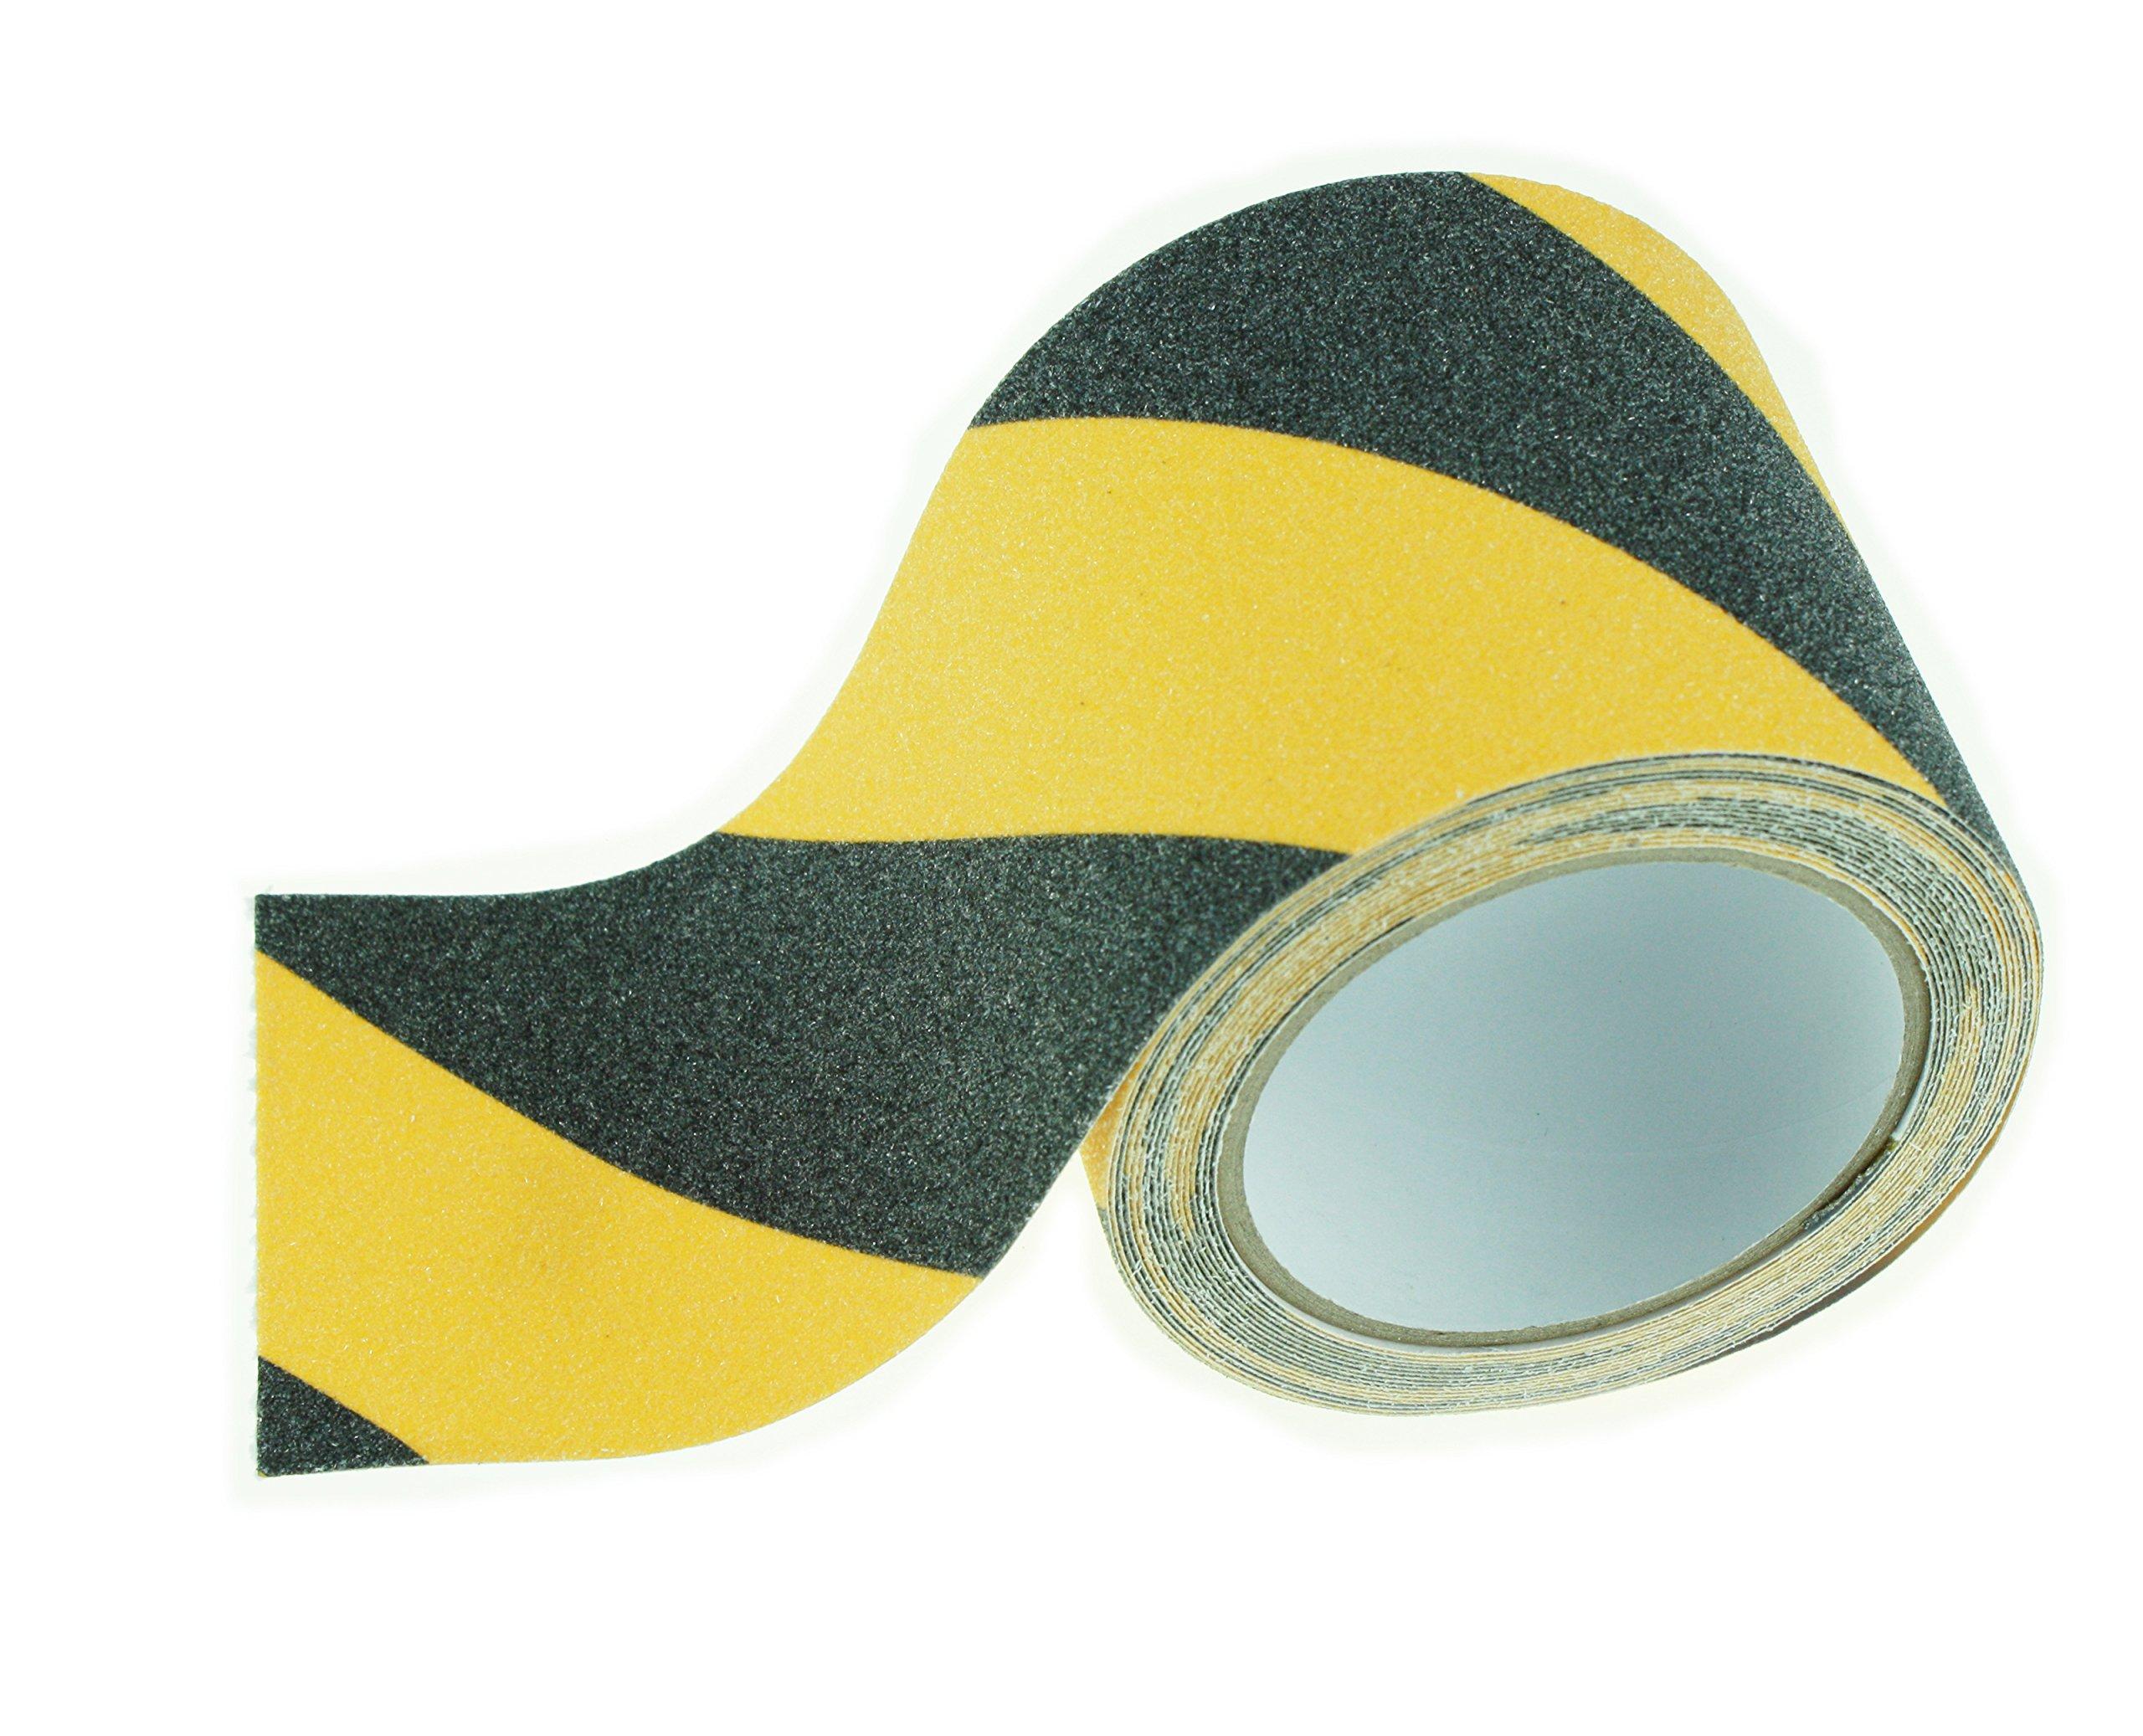 Non-slip Safety Adhesive Tape with Anti-slip Grit (WxL 4''x16', Black/Yellow)